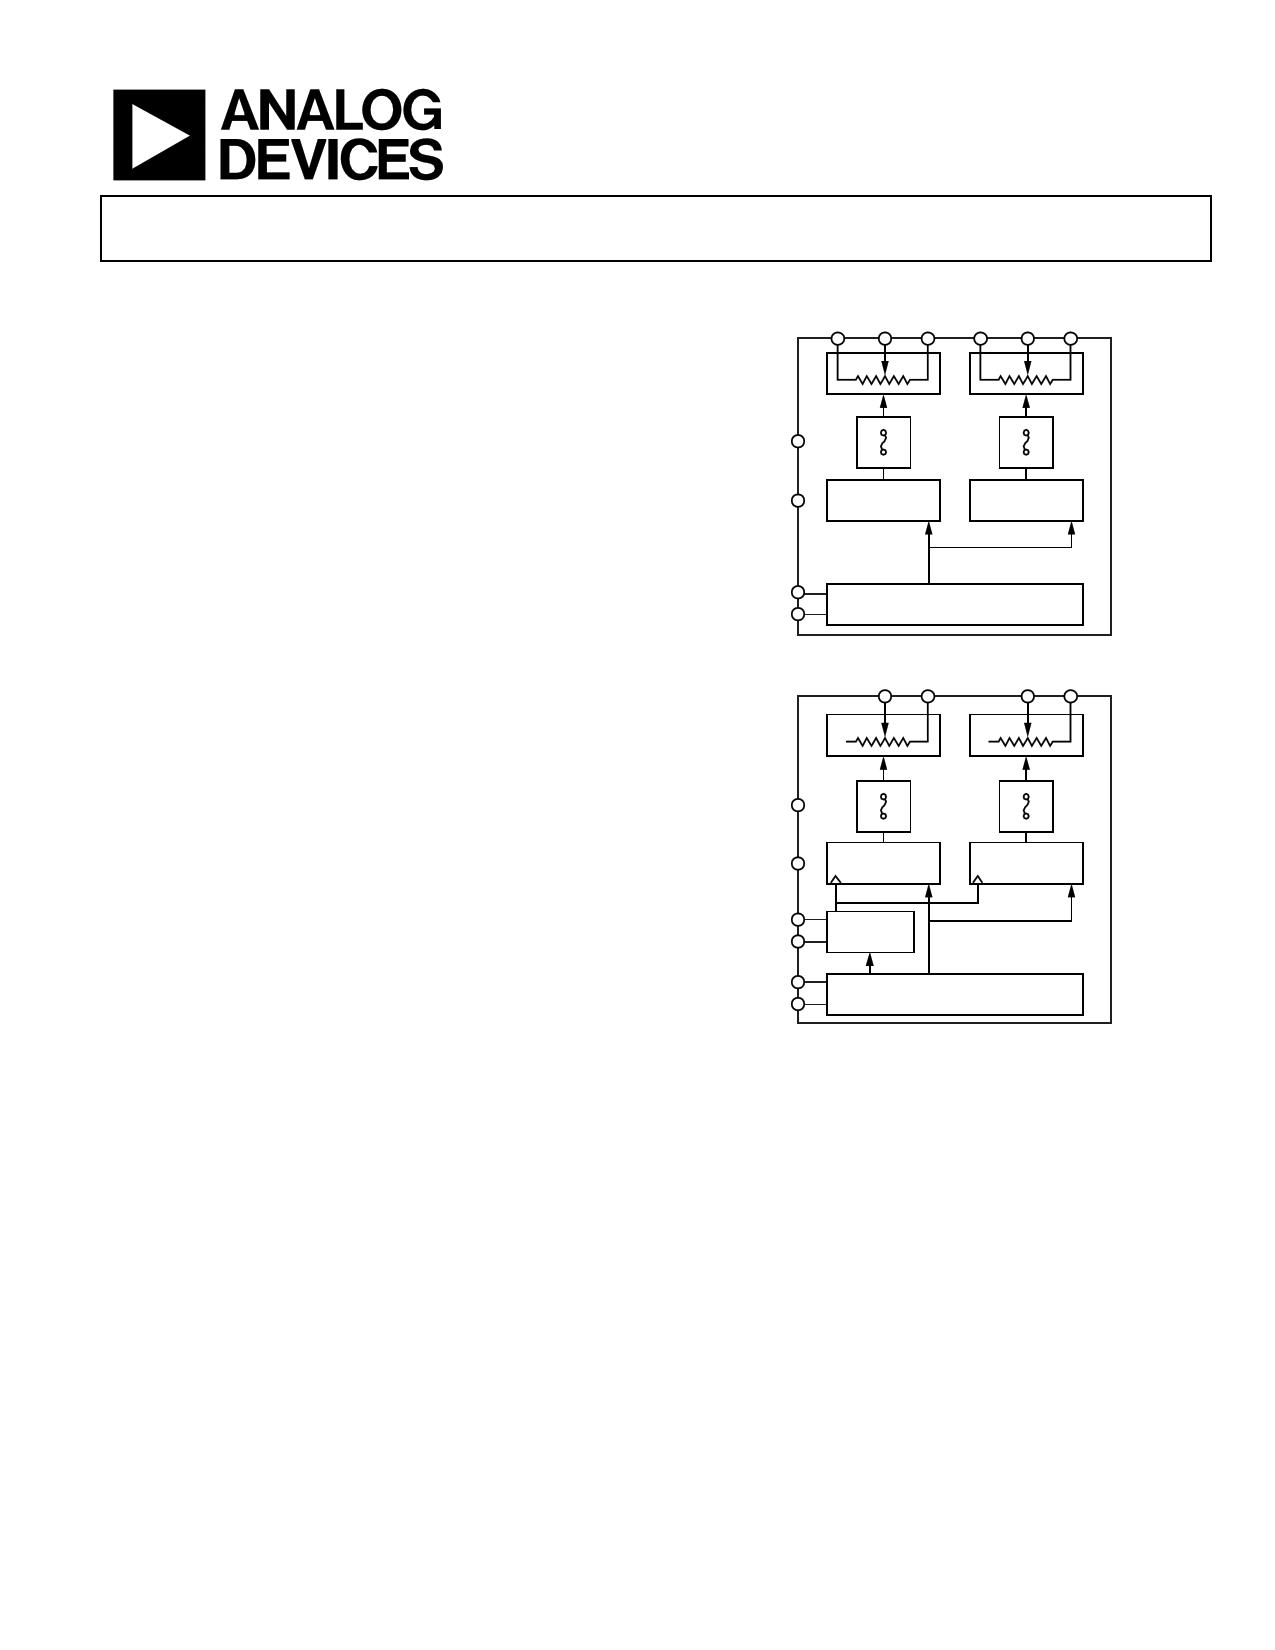 AD5172 datasheet